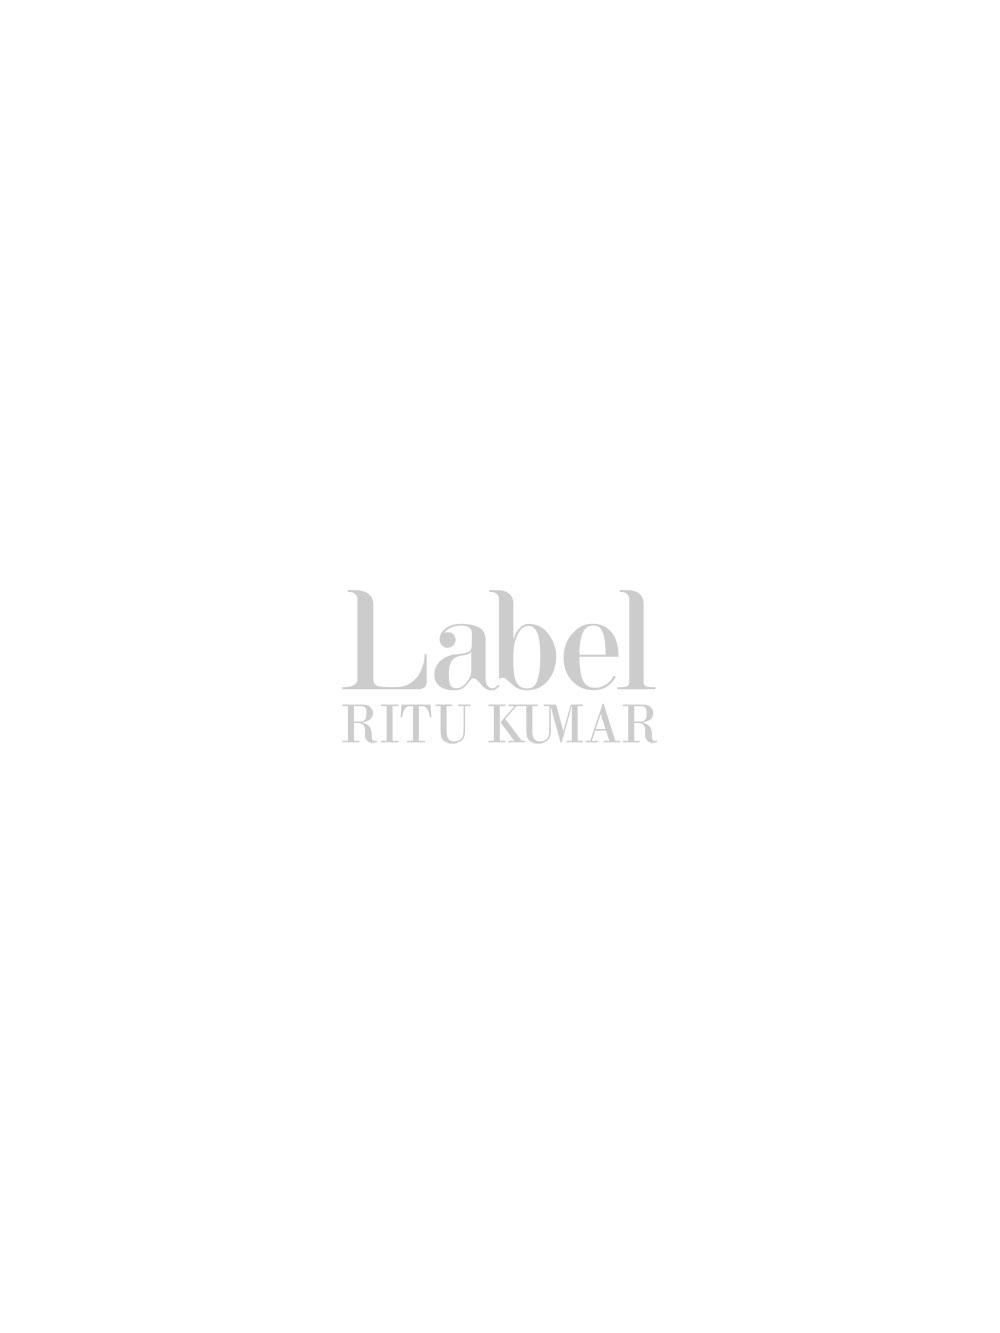 Navy Blue Kaftan By Label Ritu Kumar